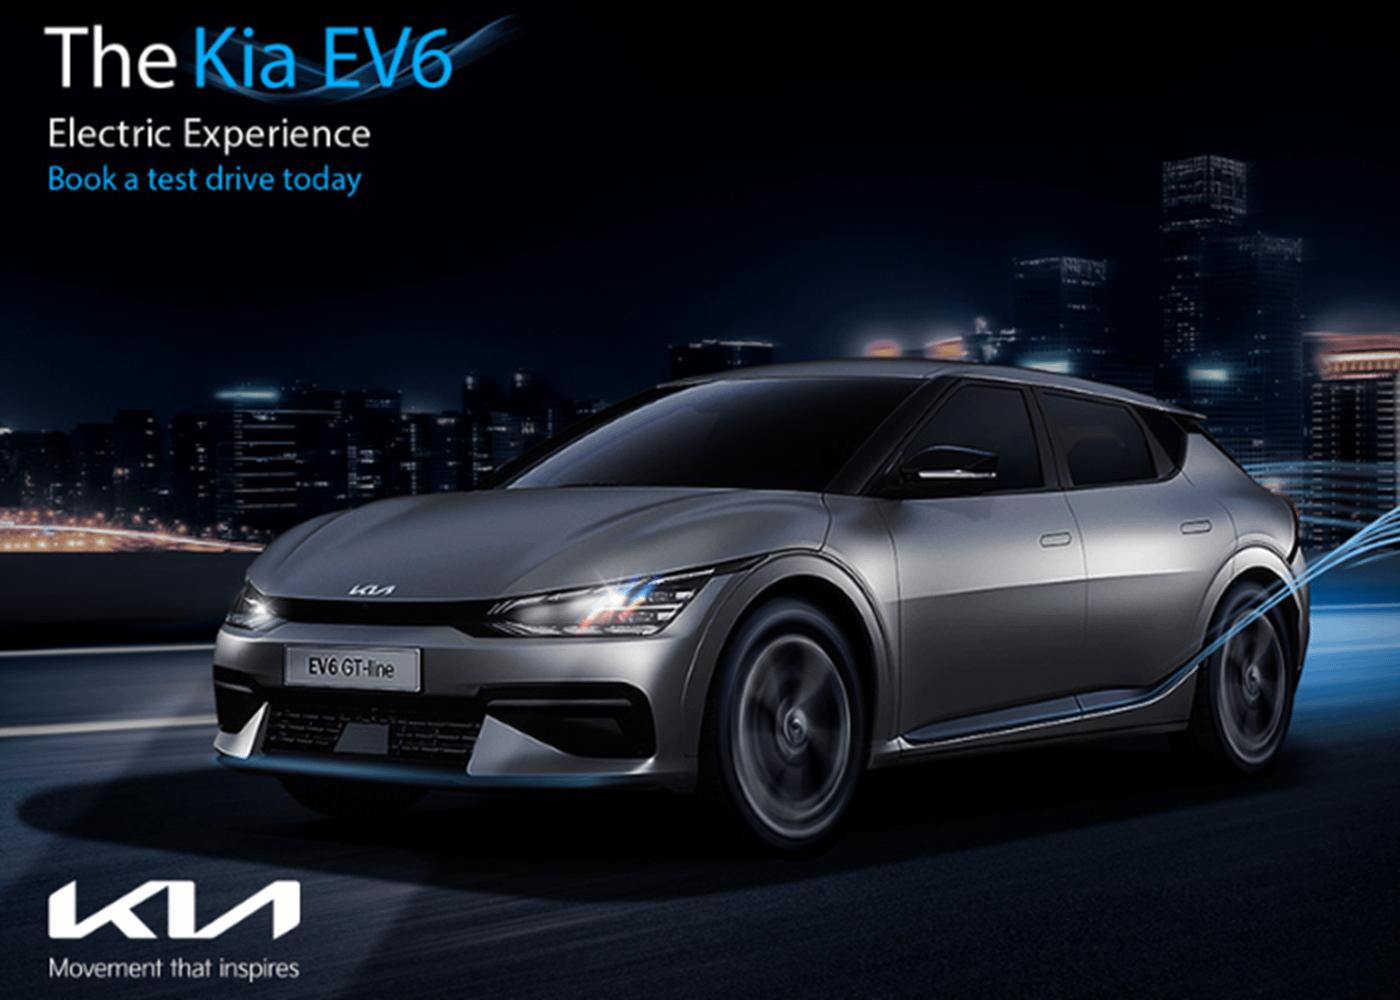 The New Kia EV6